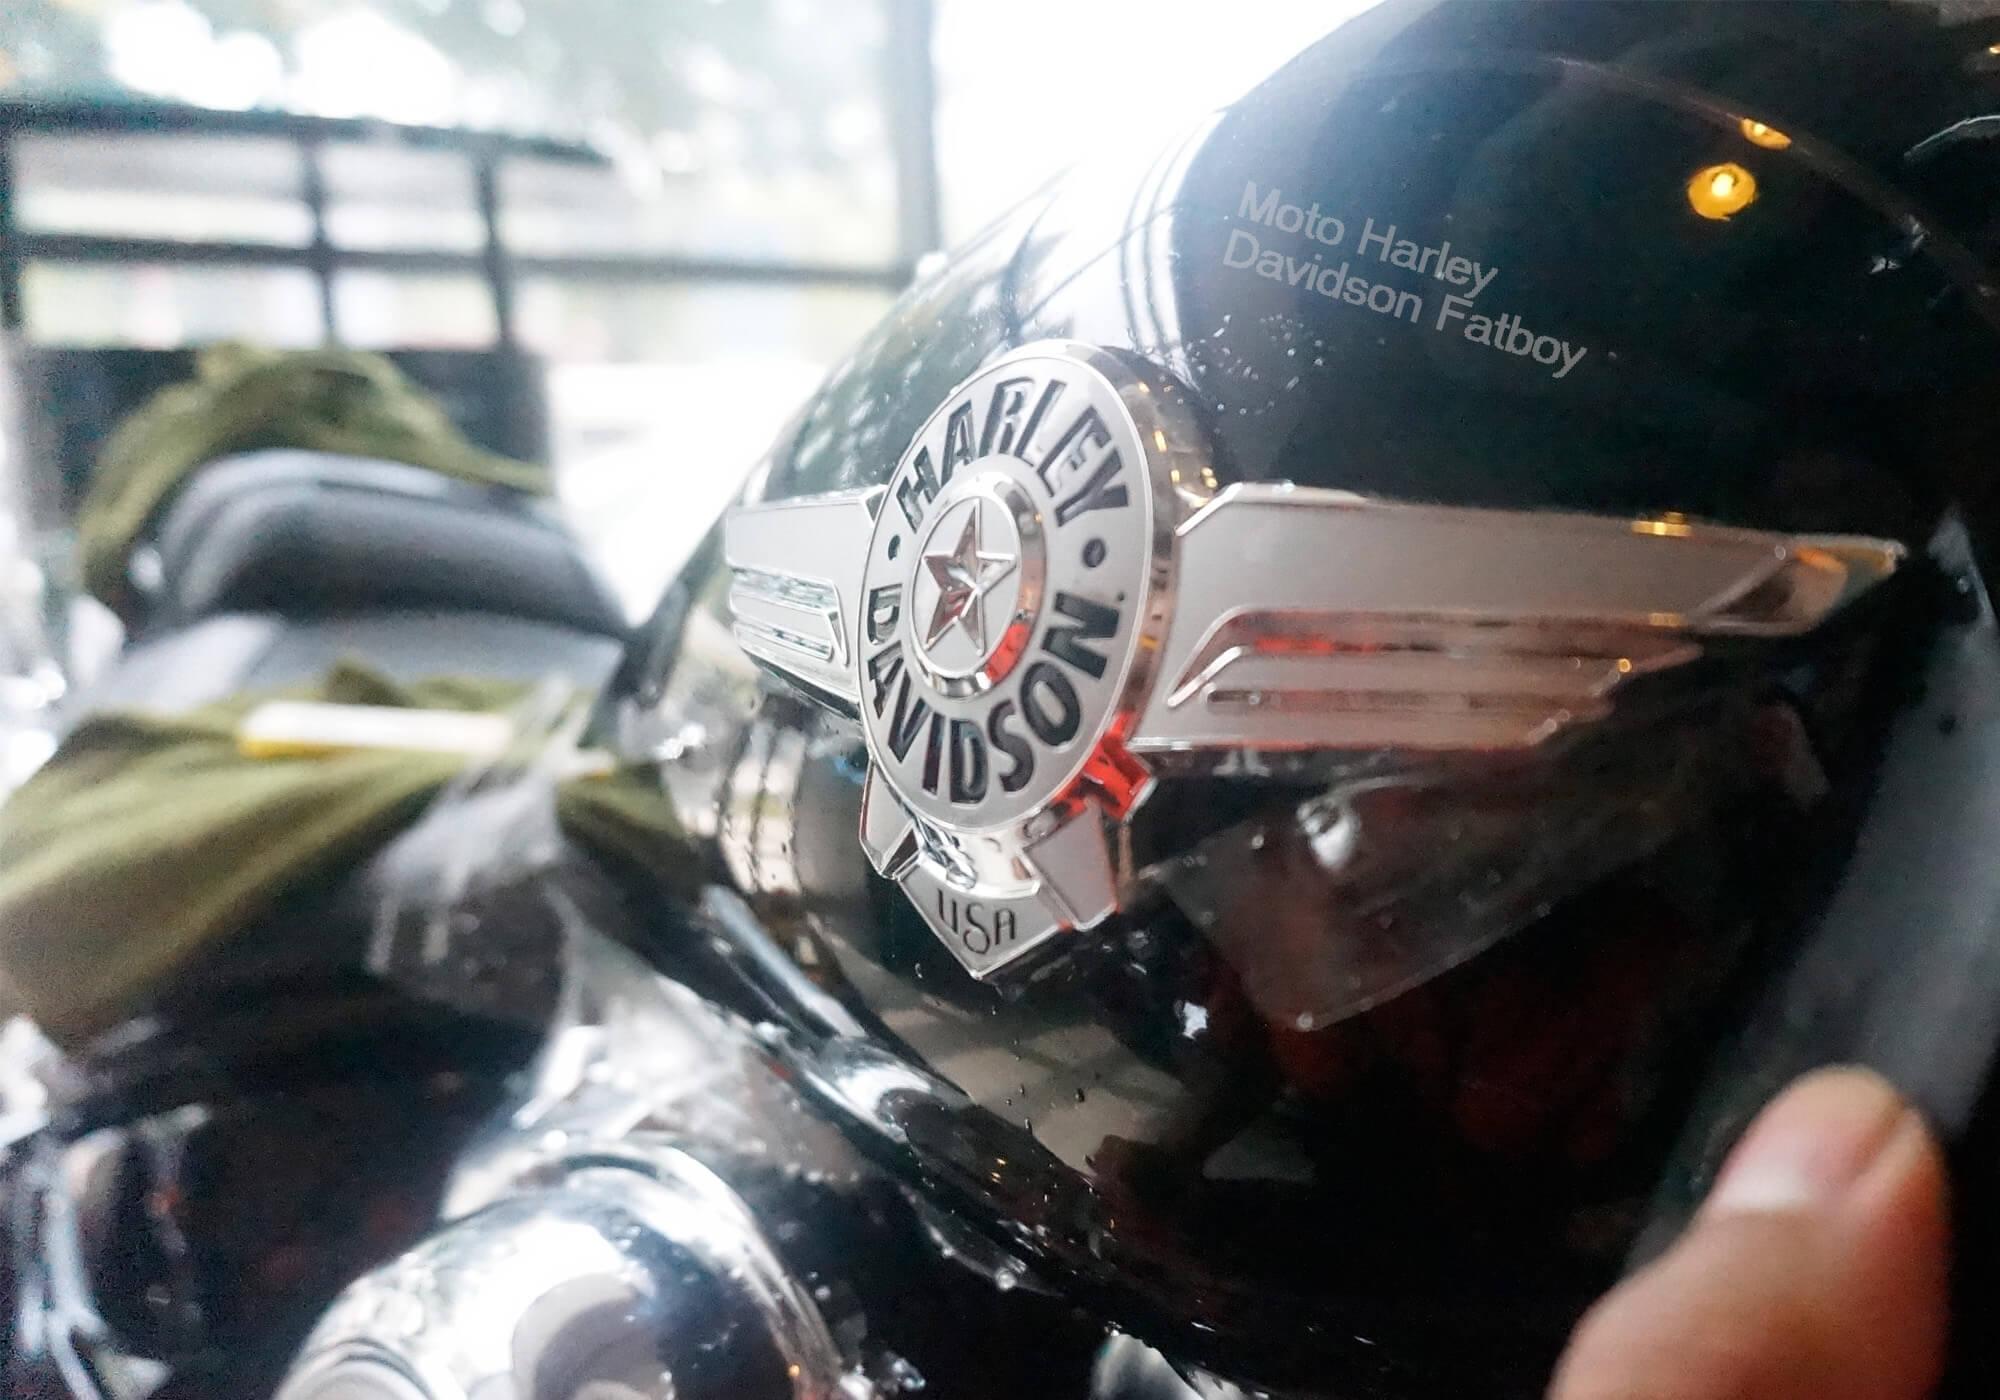 Moto Harley Davidson Fatboy